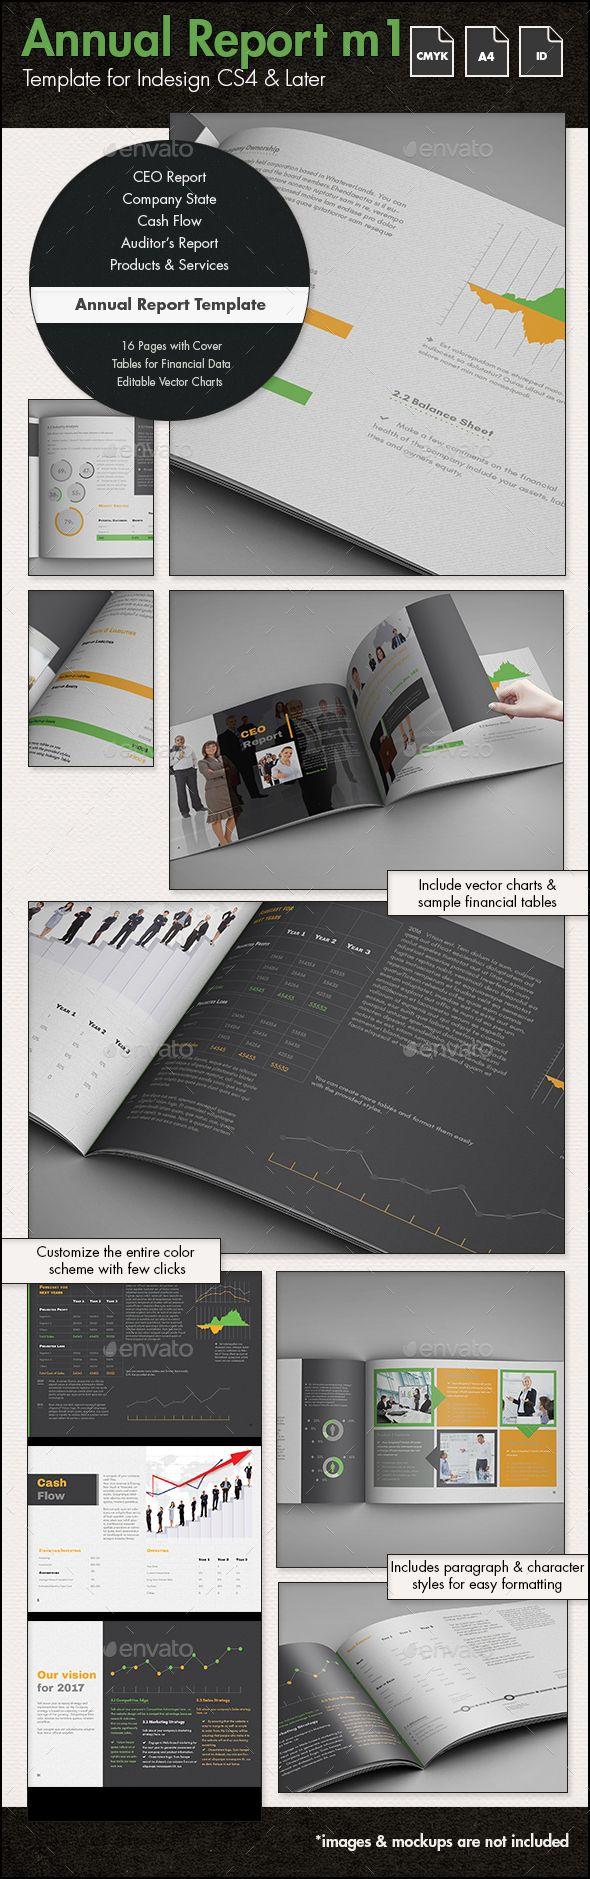 Annual Report Template M  A Landscape  Annual Reports